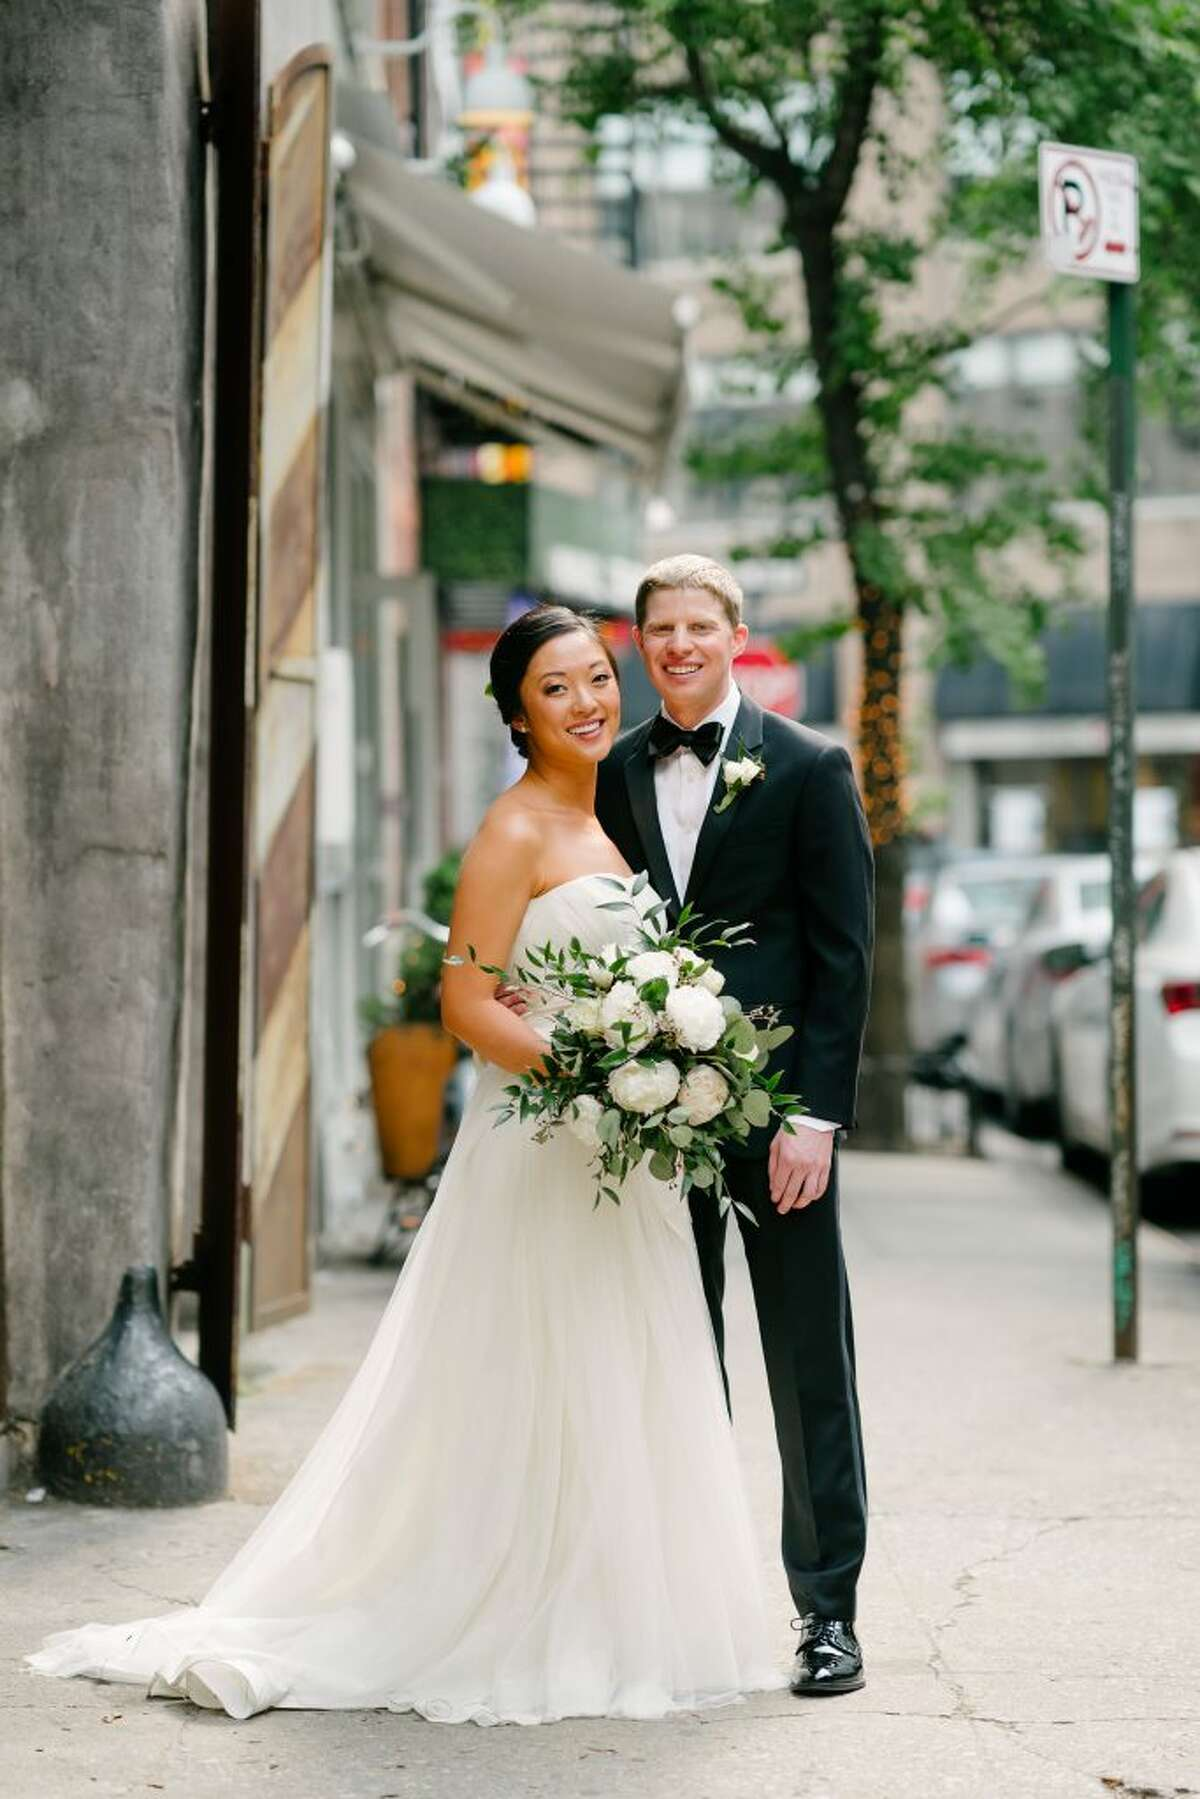 Kate Yan and Andrew Furman